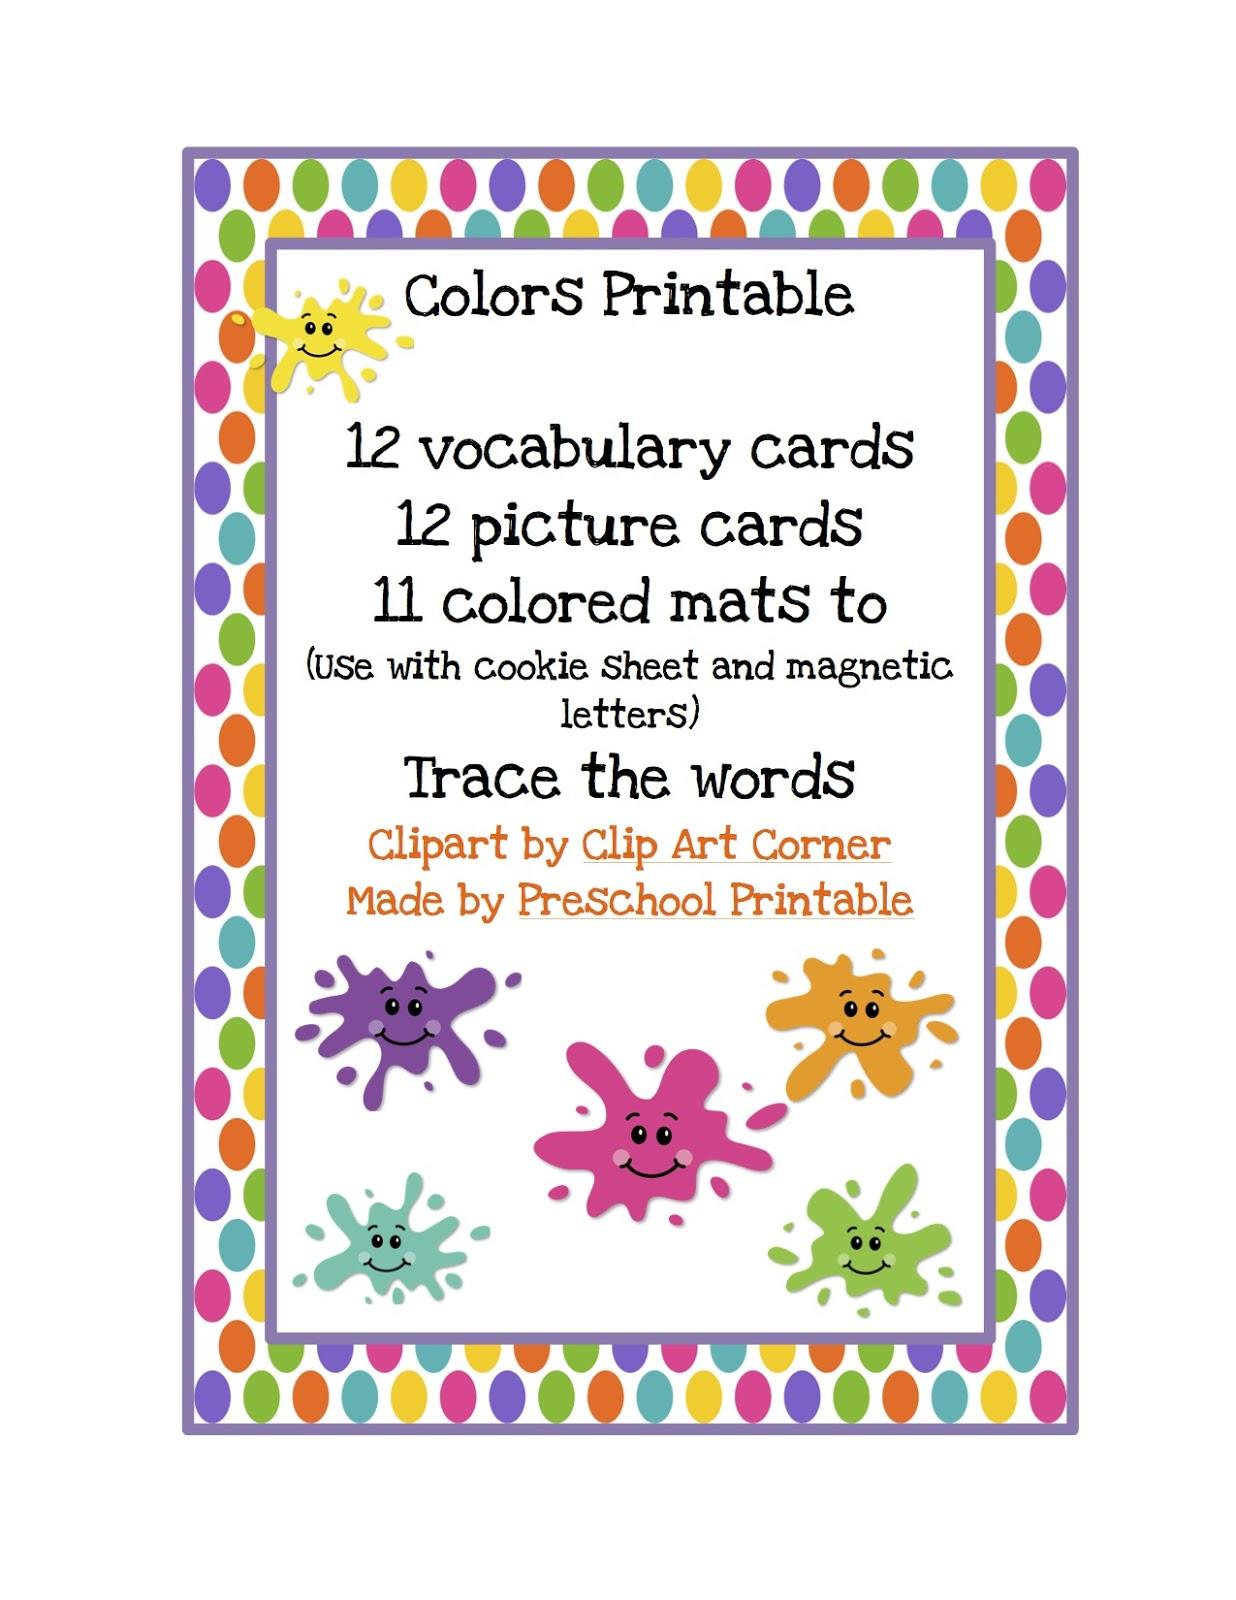 learning colors printable preschool printables. Black Bedroom Furniture Sets. Home Design Ideas